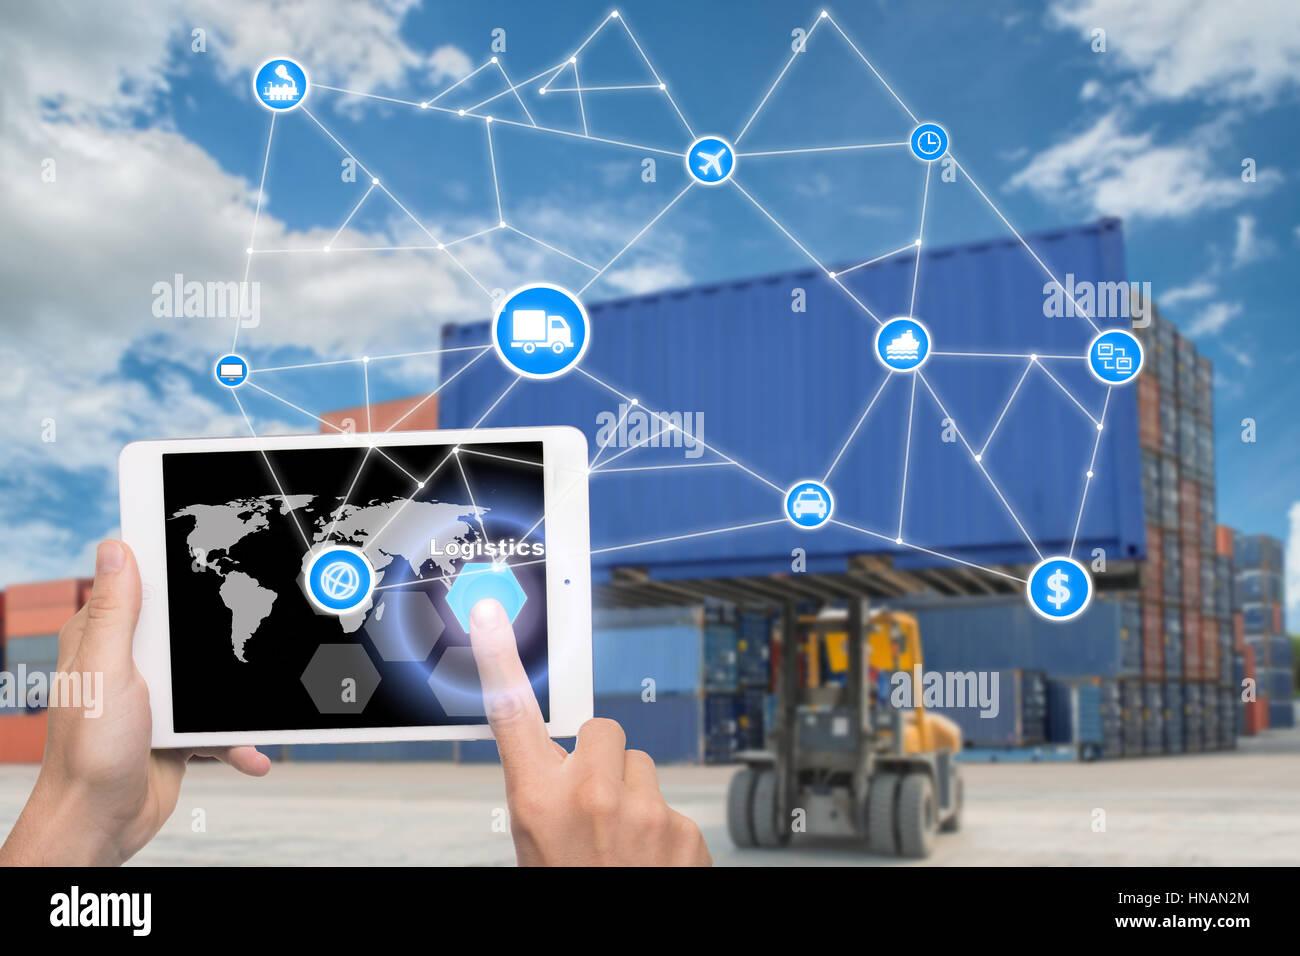 Hand halten Tablet drängt Taste Logistik Technologie Schnittstelle globaler Partner Verbindung für Logistik Stockbild